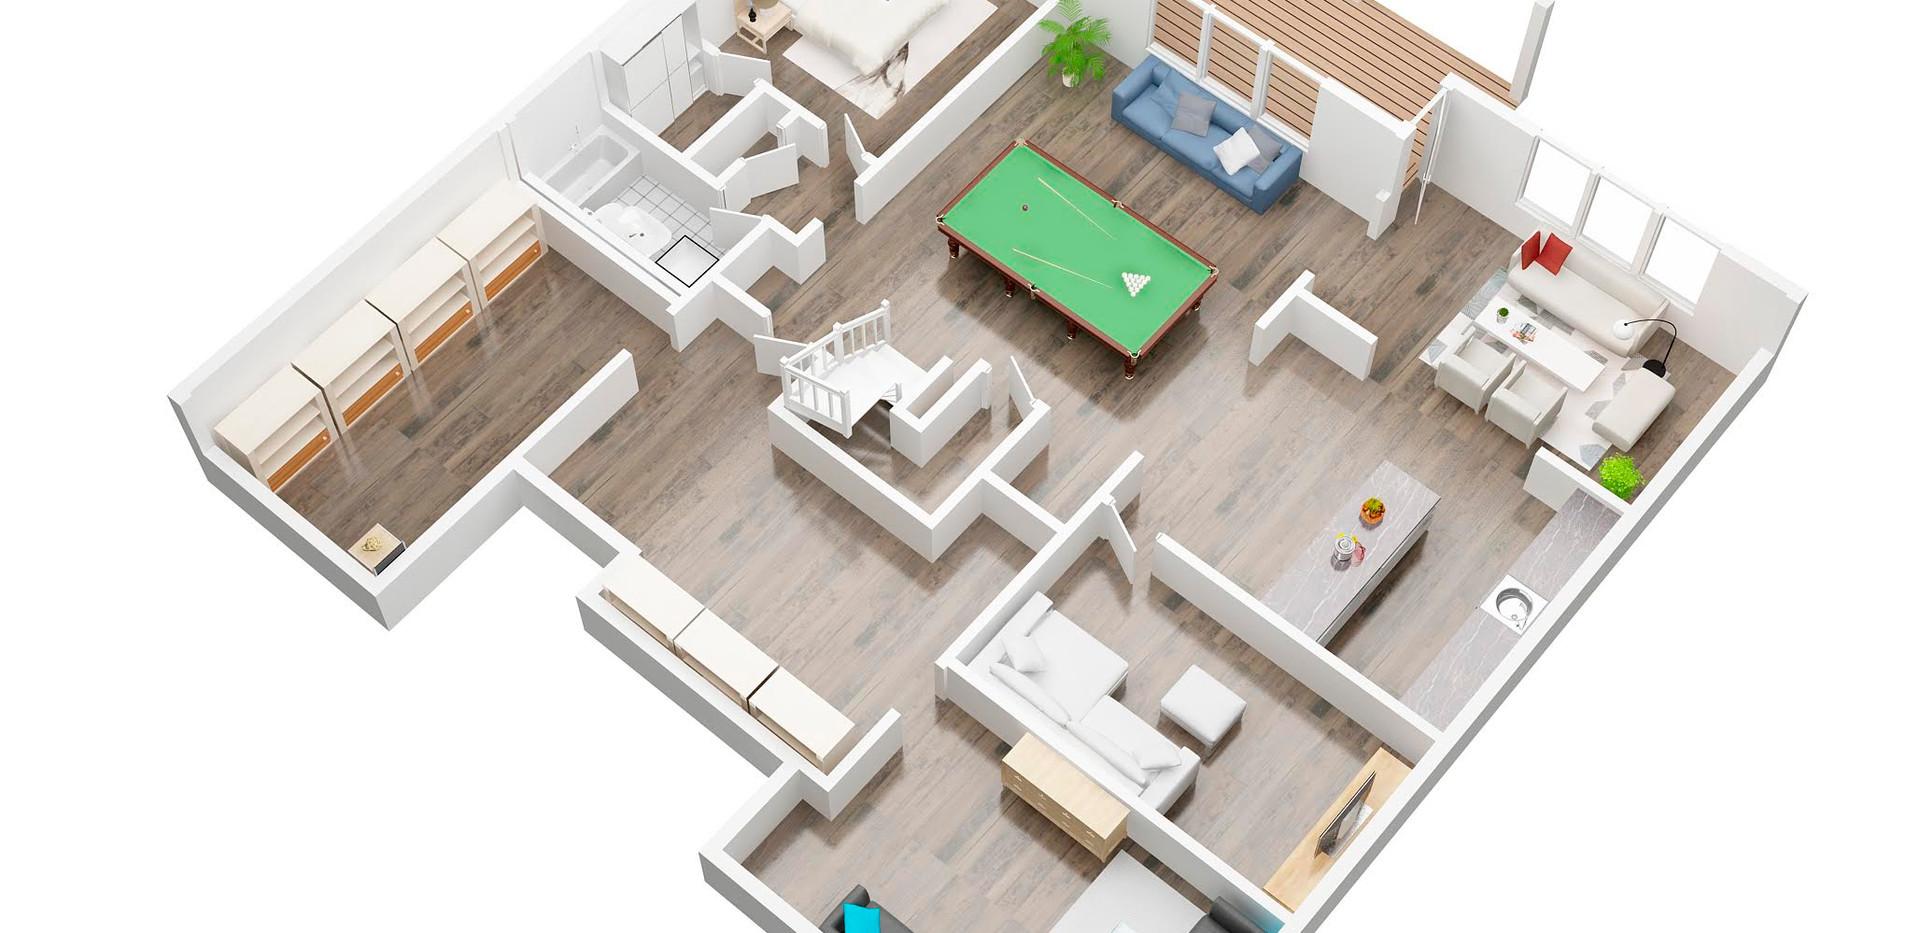 Leapfrogsales_basement_3D  floor plan